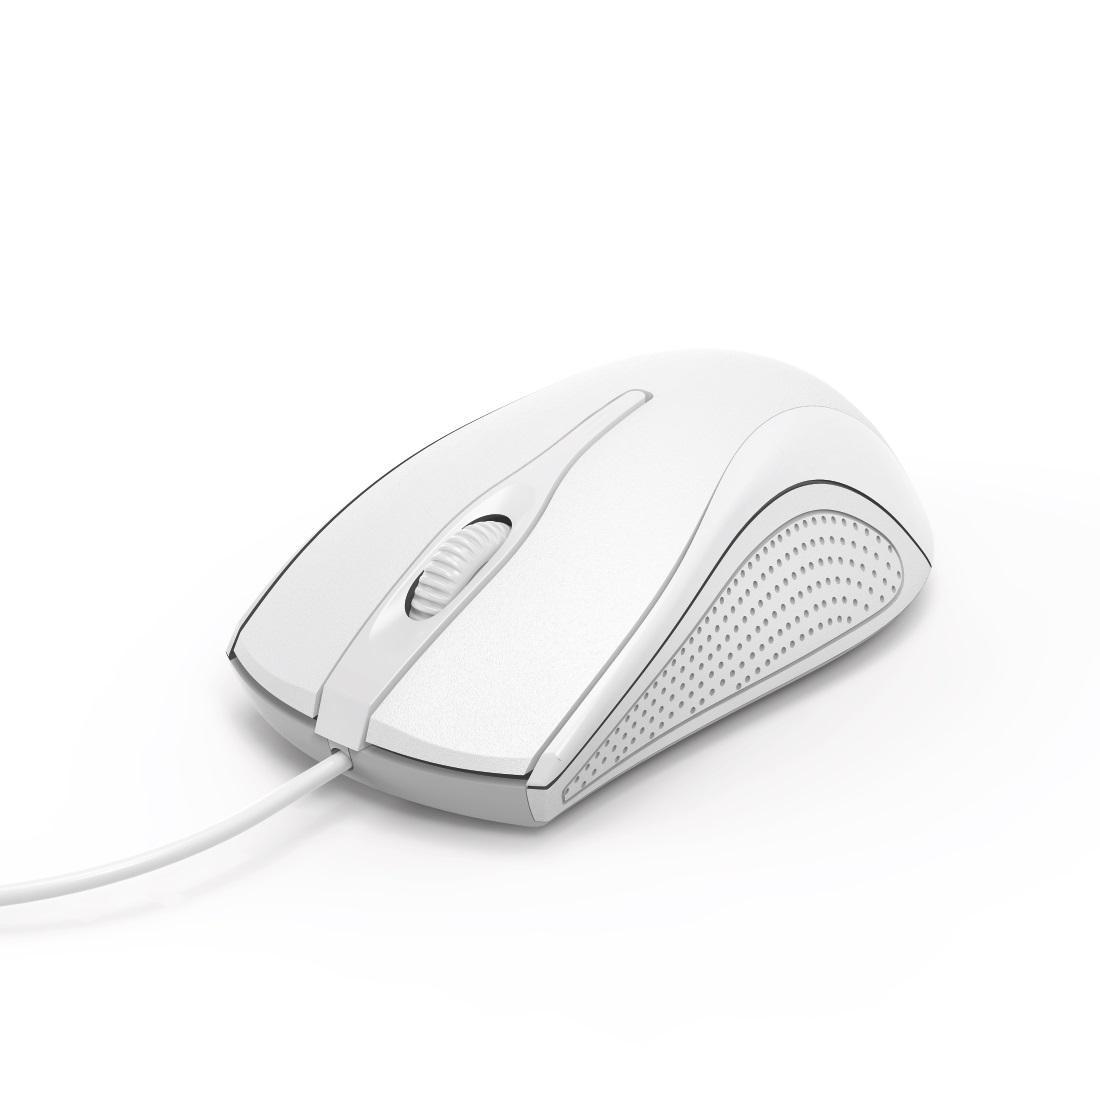 Оптична мишка HAMA MC-200, кабел 1.5 м, USB, 1200 dpi, 3 бутона, Бял